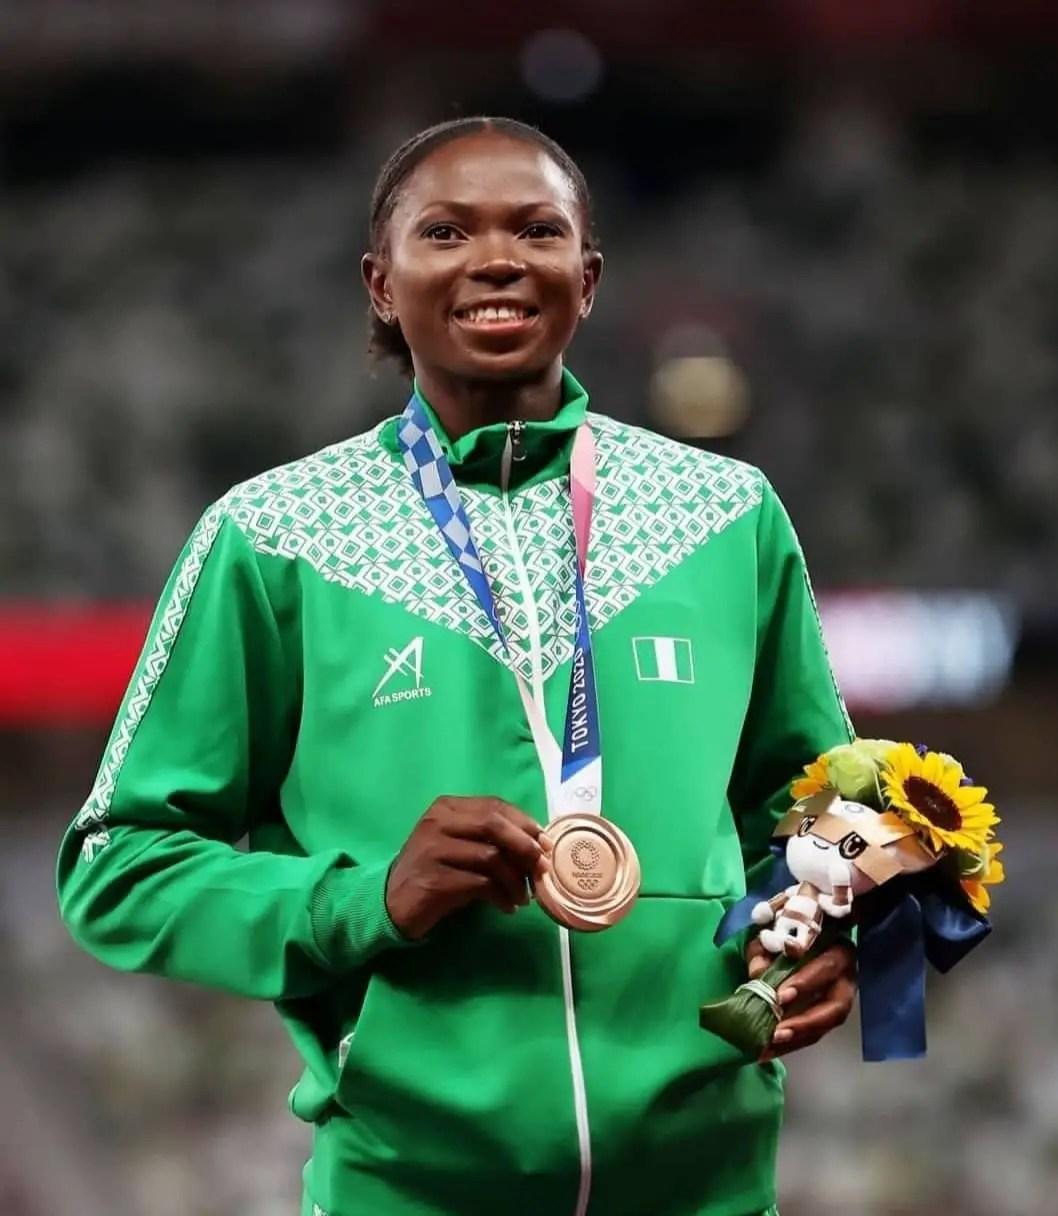 12 Nigerian World Athletics U-20 Championships Graduates Who Became Olympic Medallists